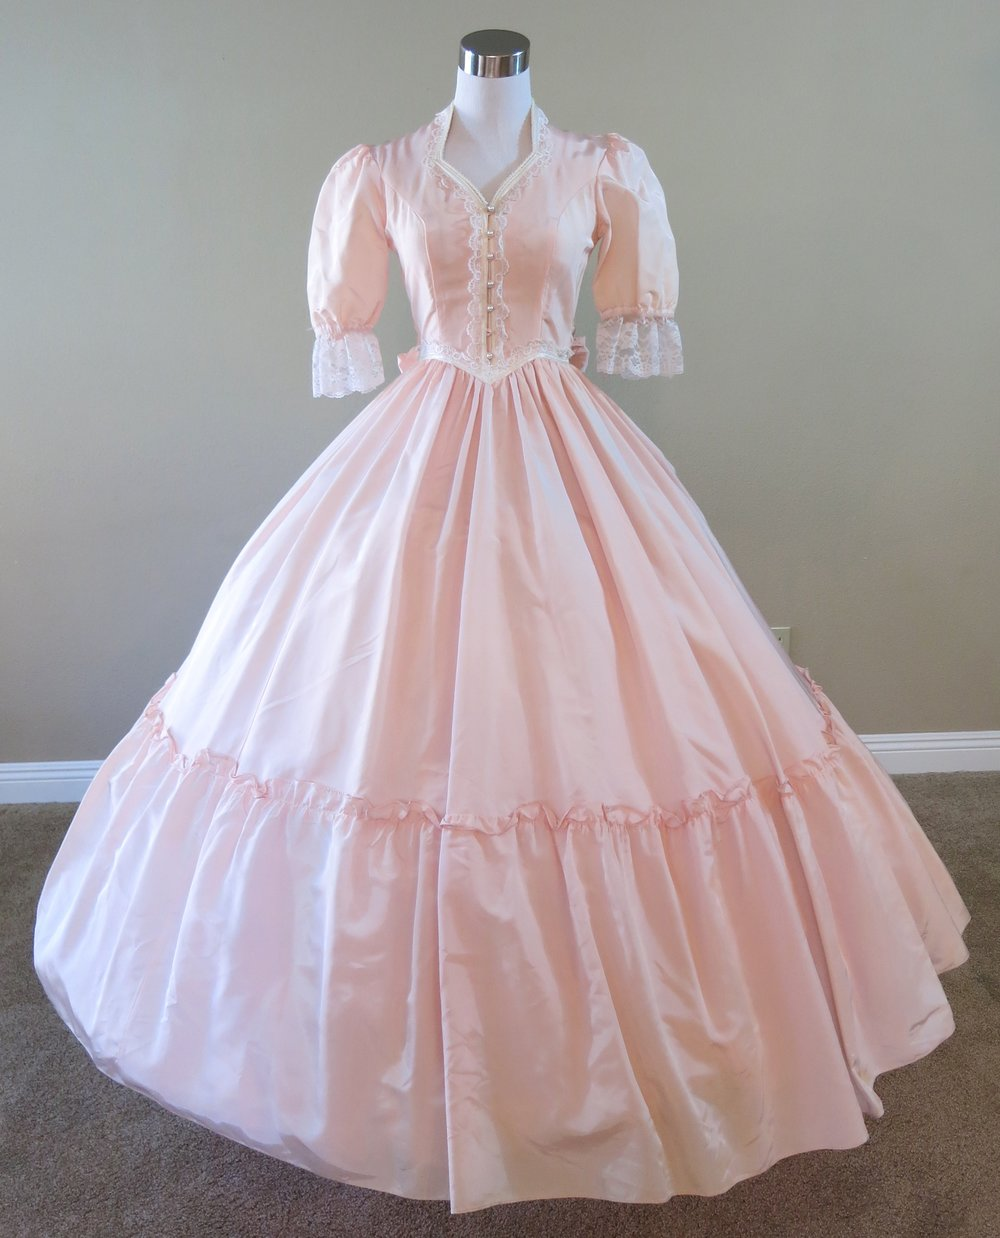 1860 Southern Belle Dresses